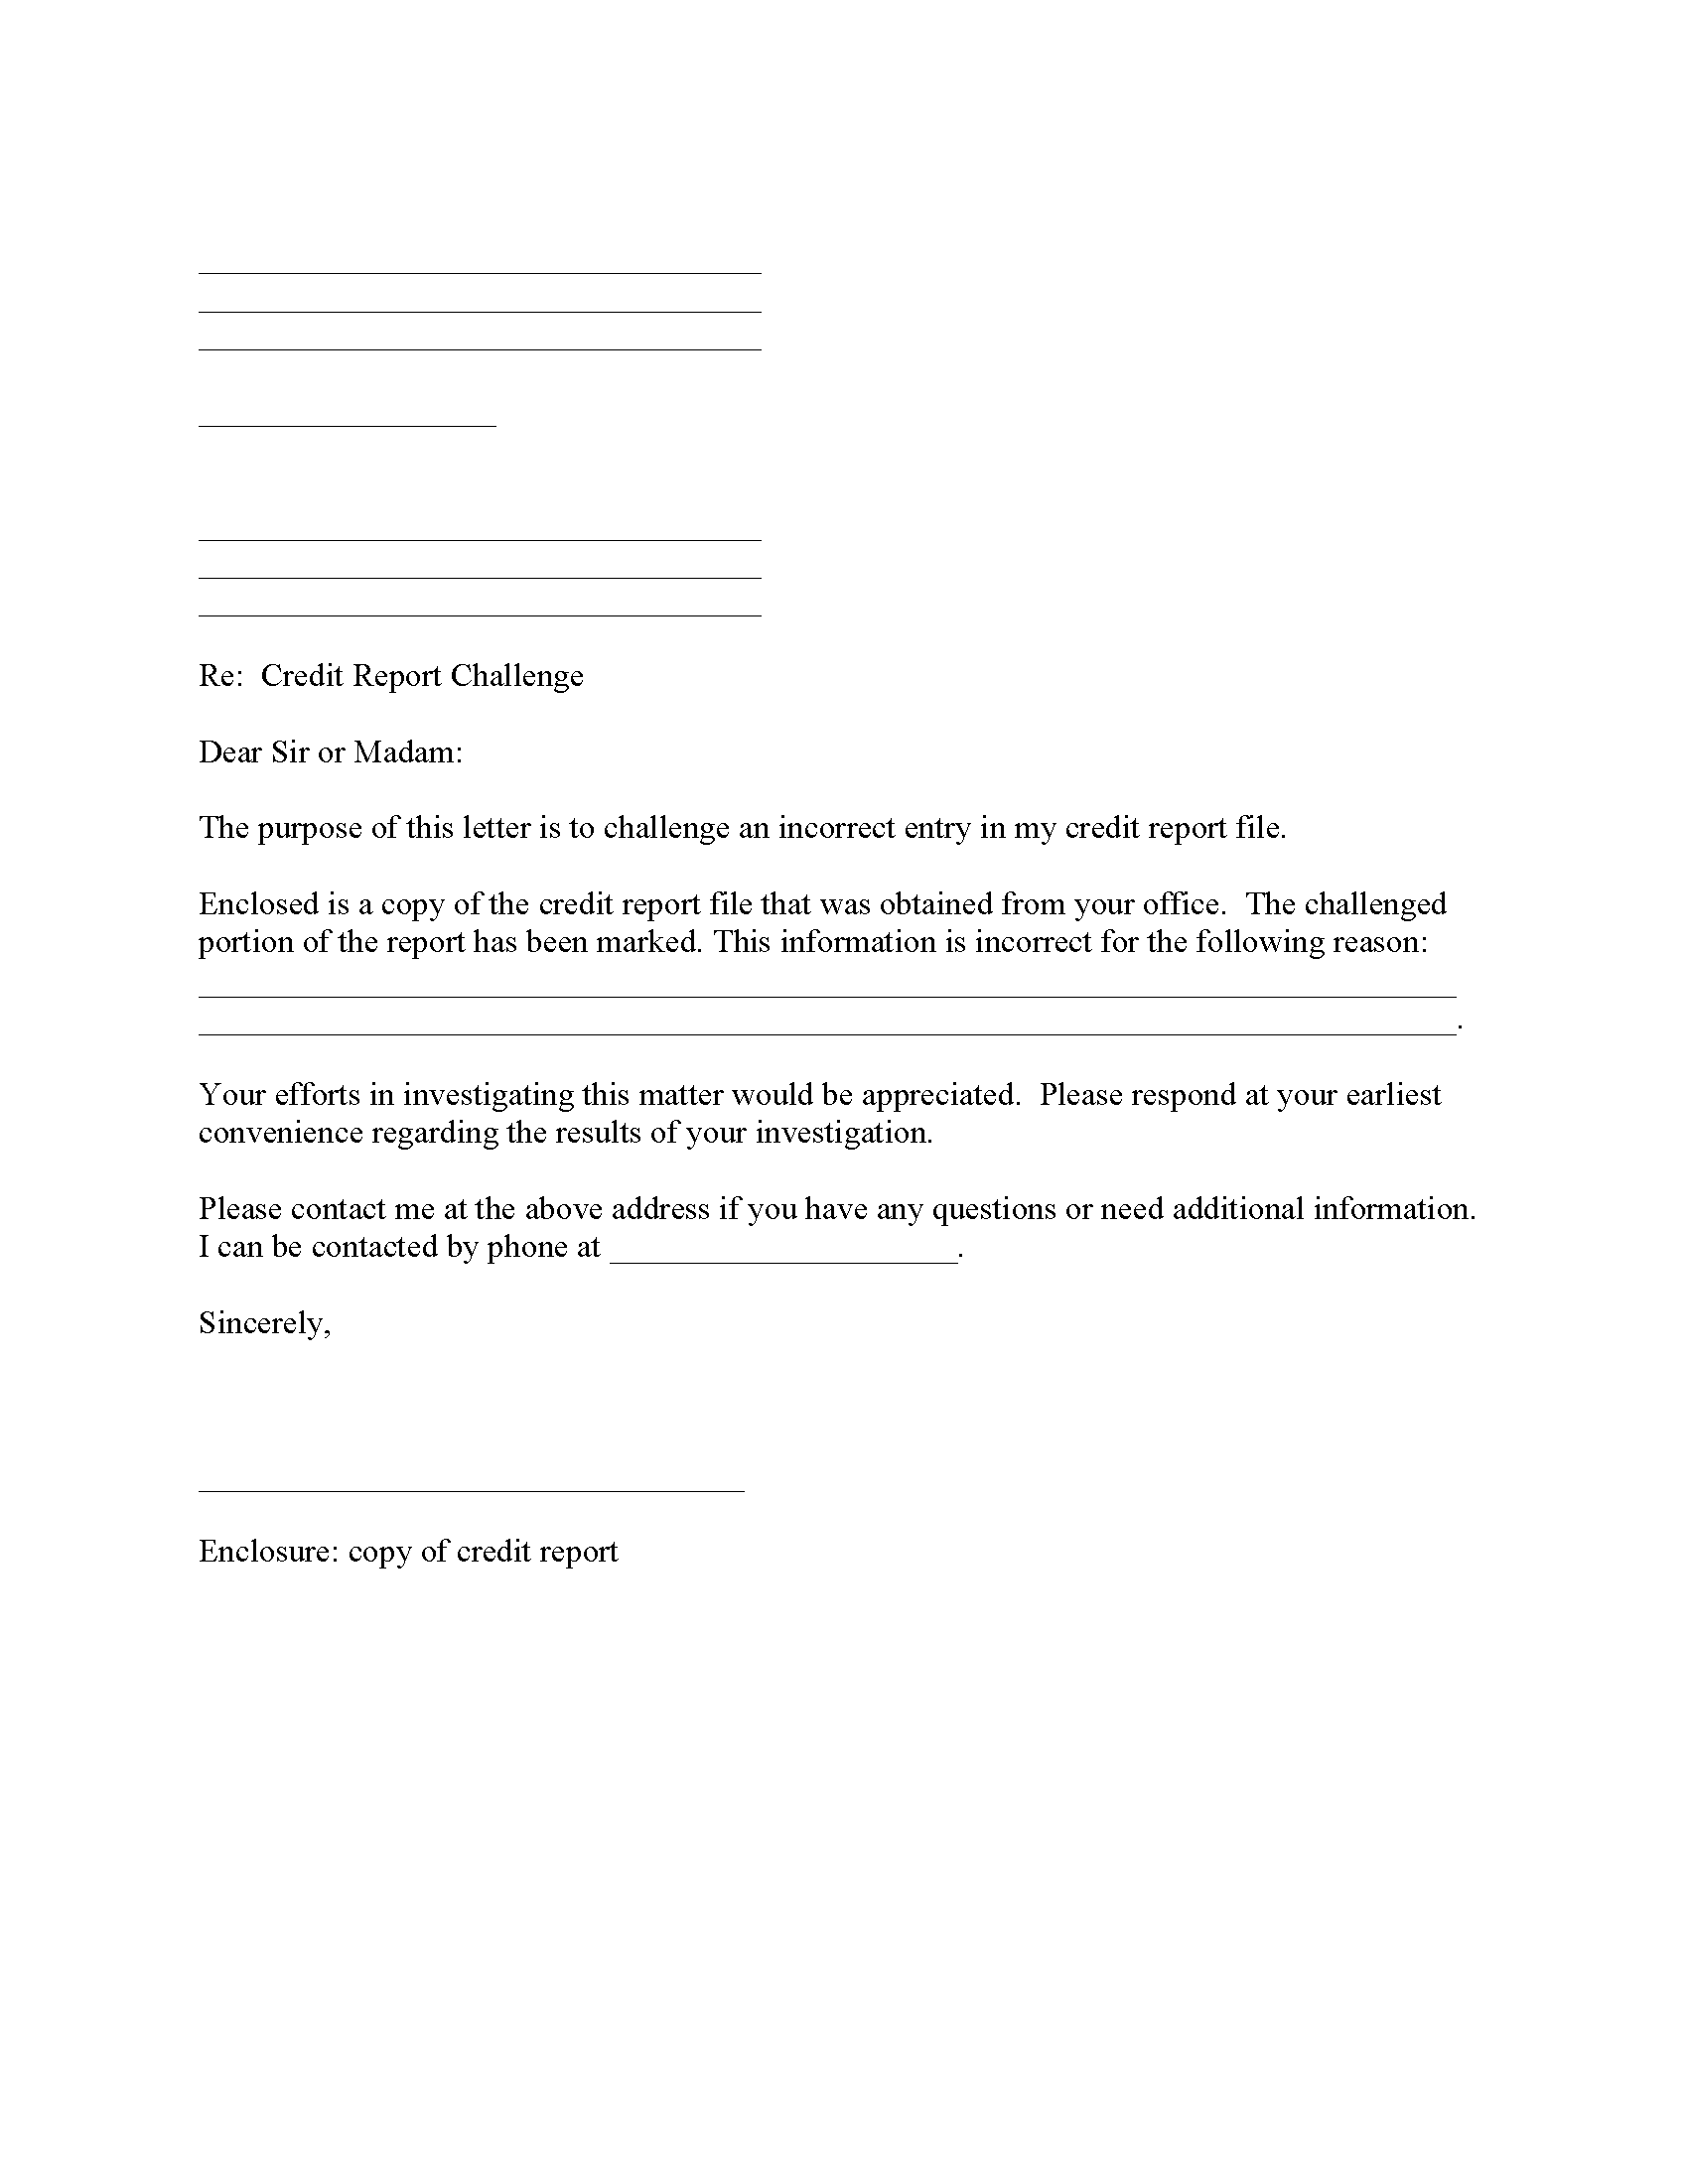 Credit Report Challenge